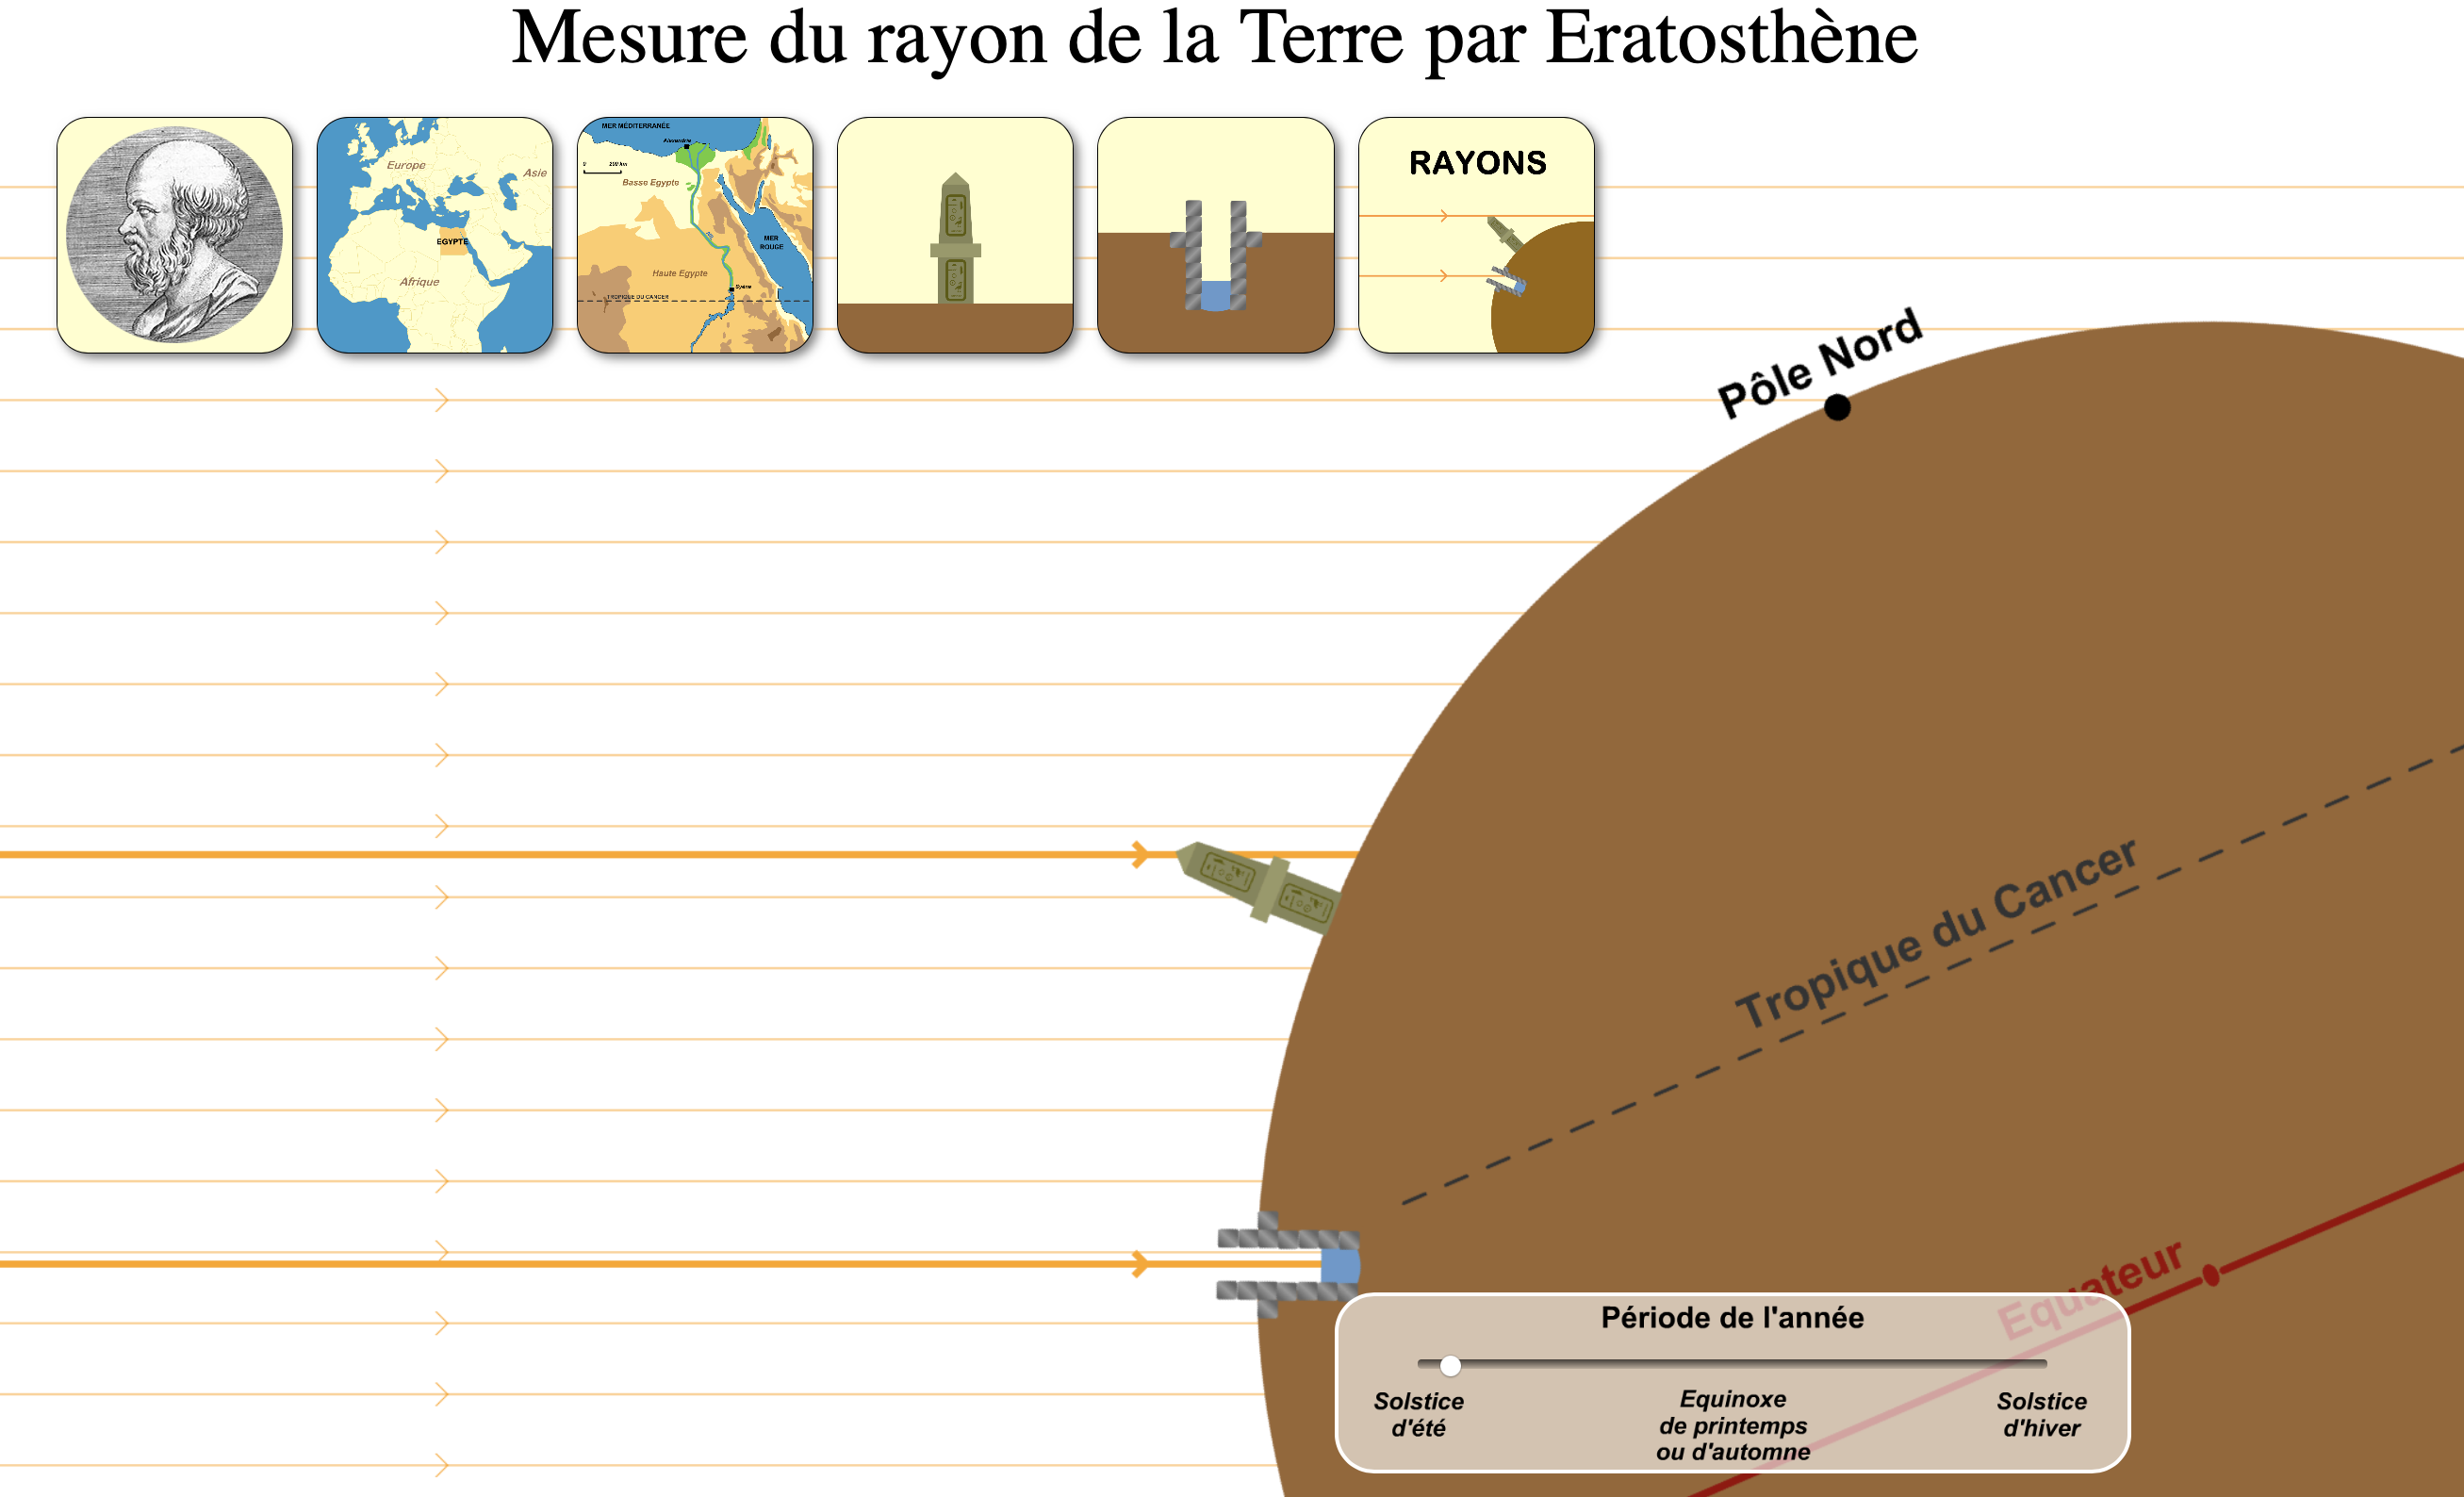 Mesurer le rayon de la Terre : Eratosthène